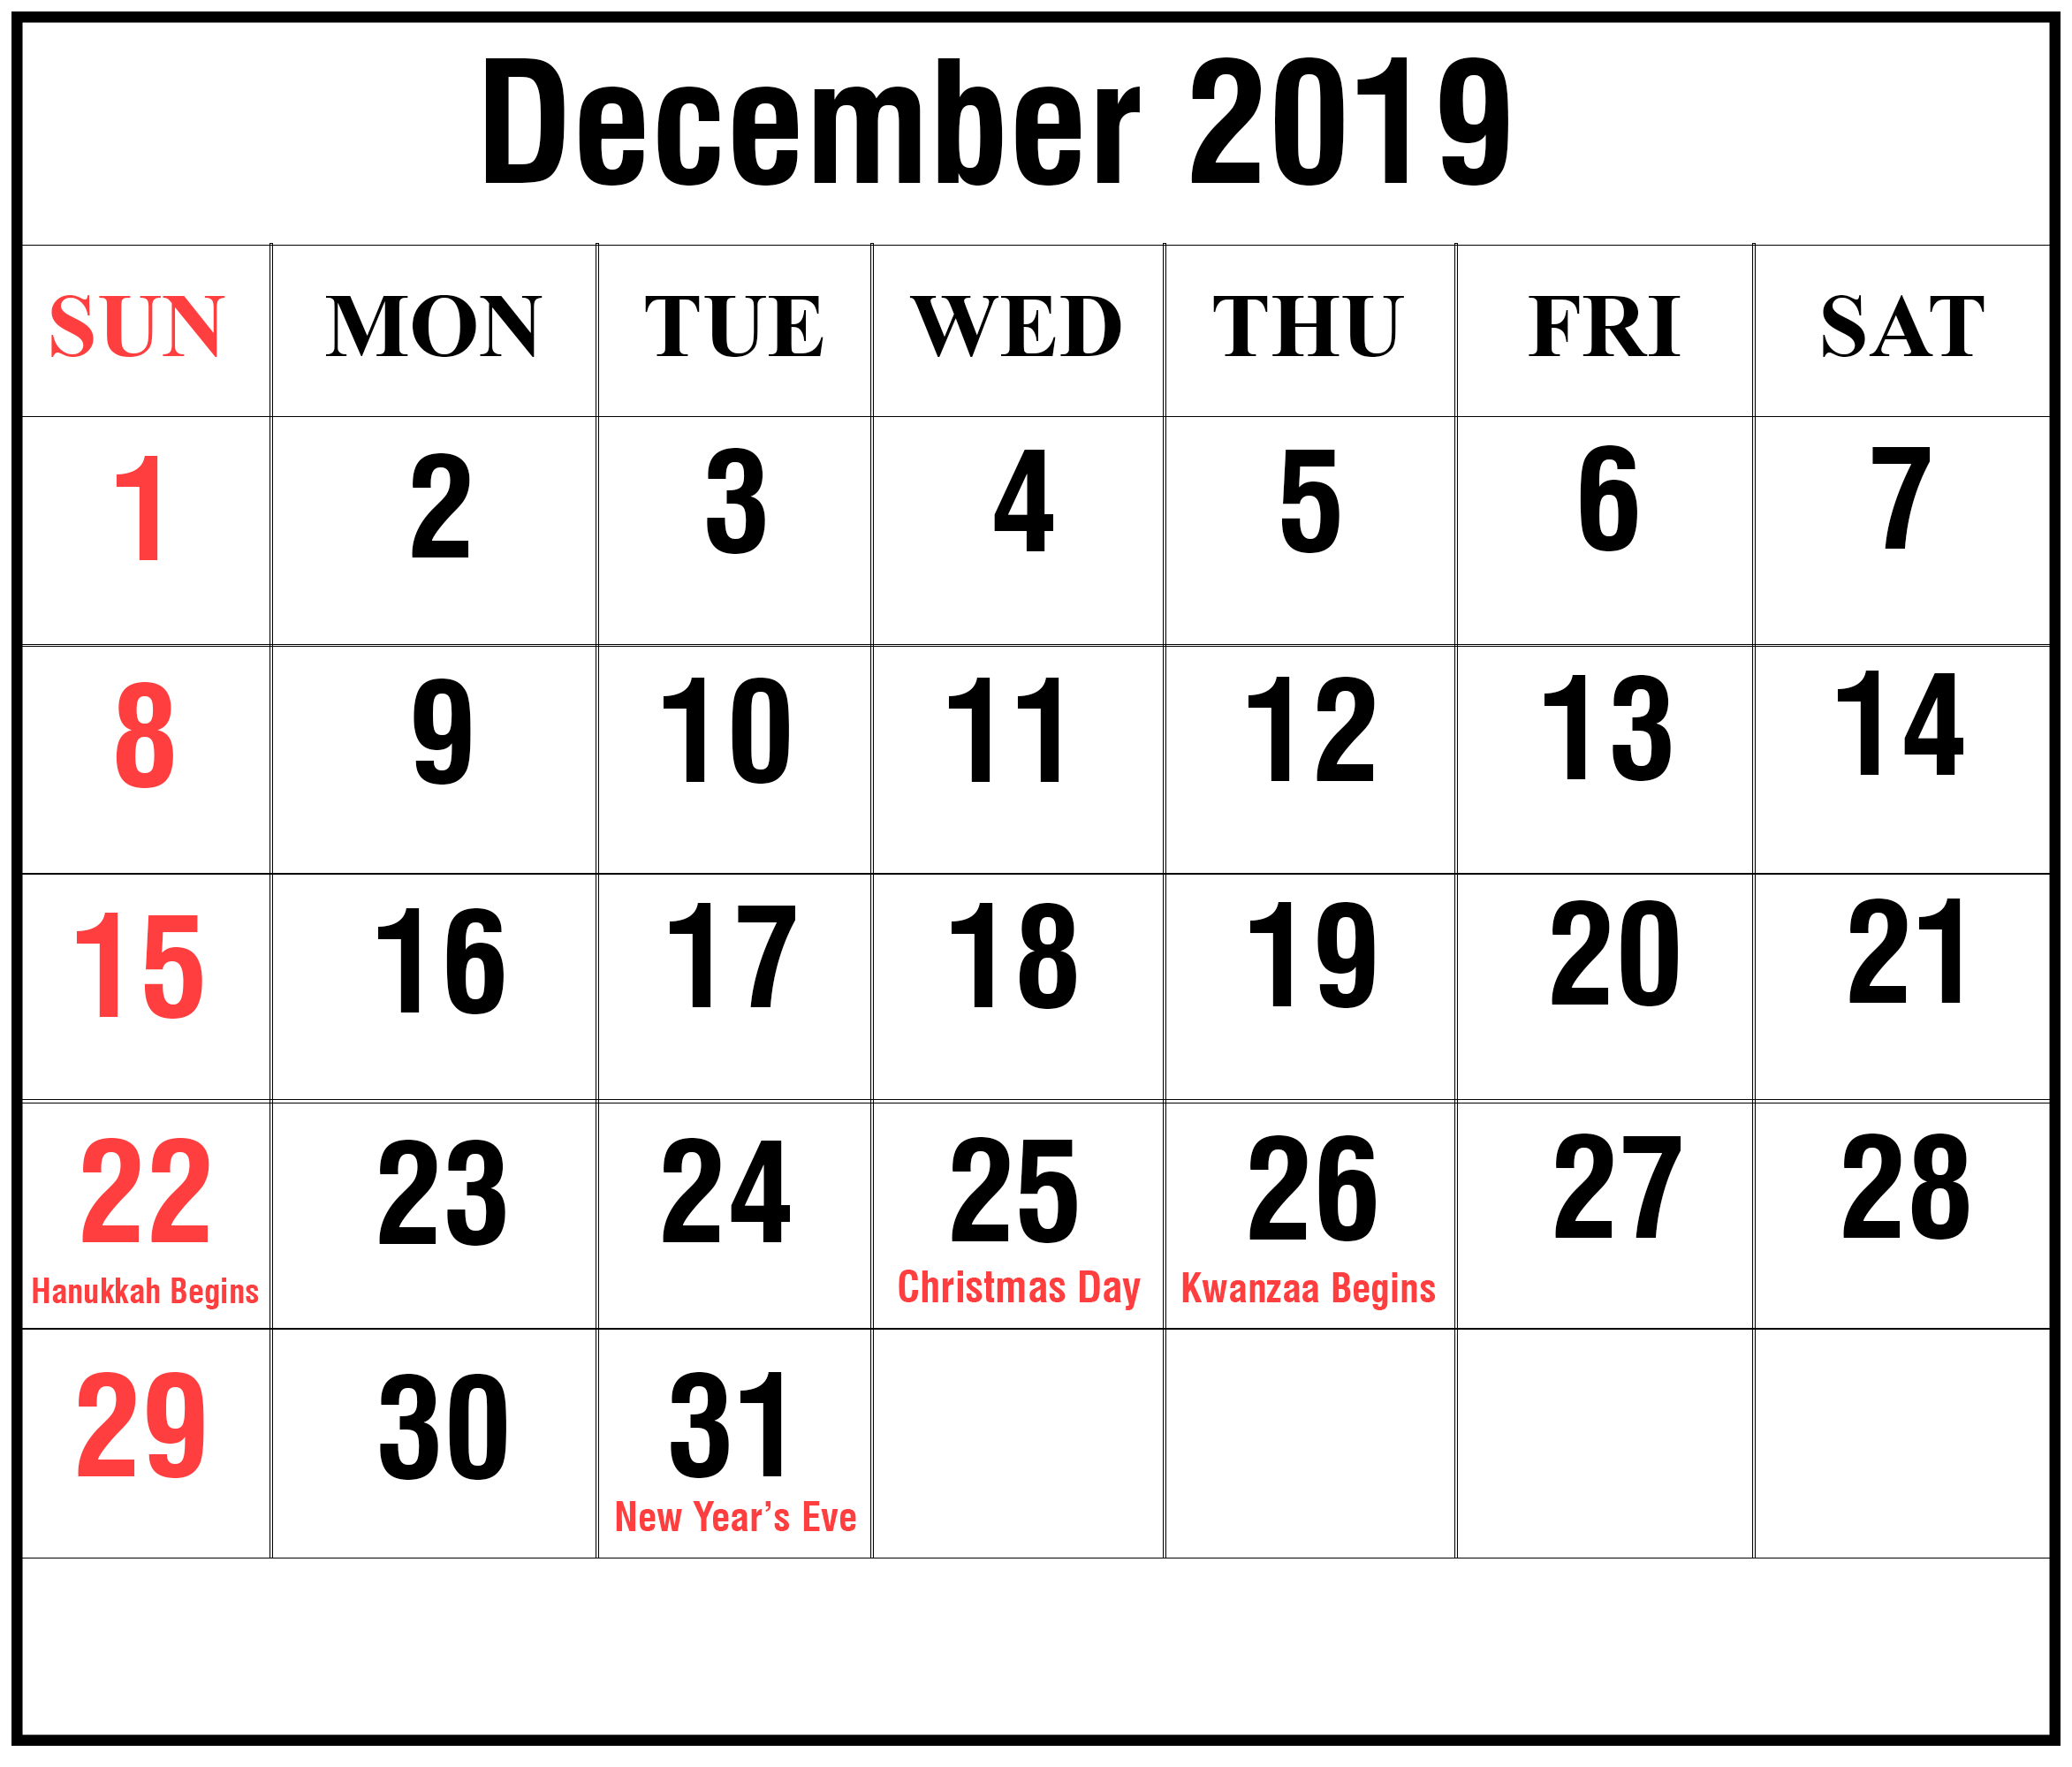 December 2019 Calendar Printable | December Blank Calendar